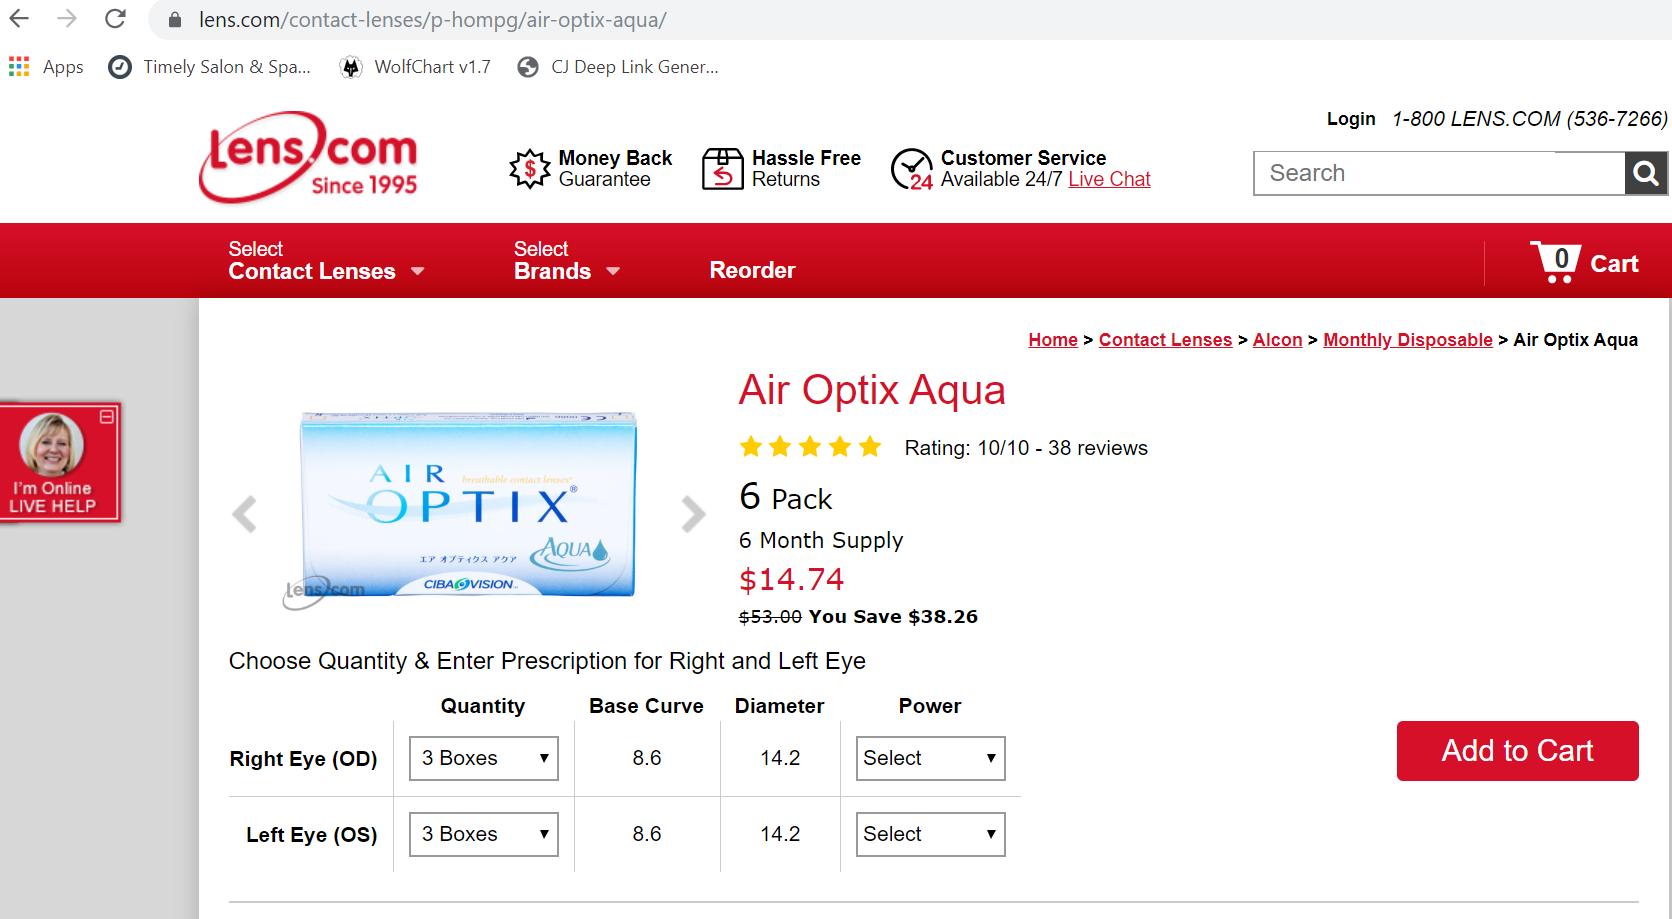 Screenshot of the price of a 6-pack of Air Optix Aqua at Lens.com